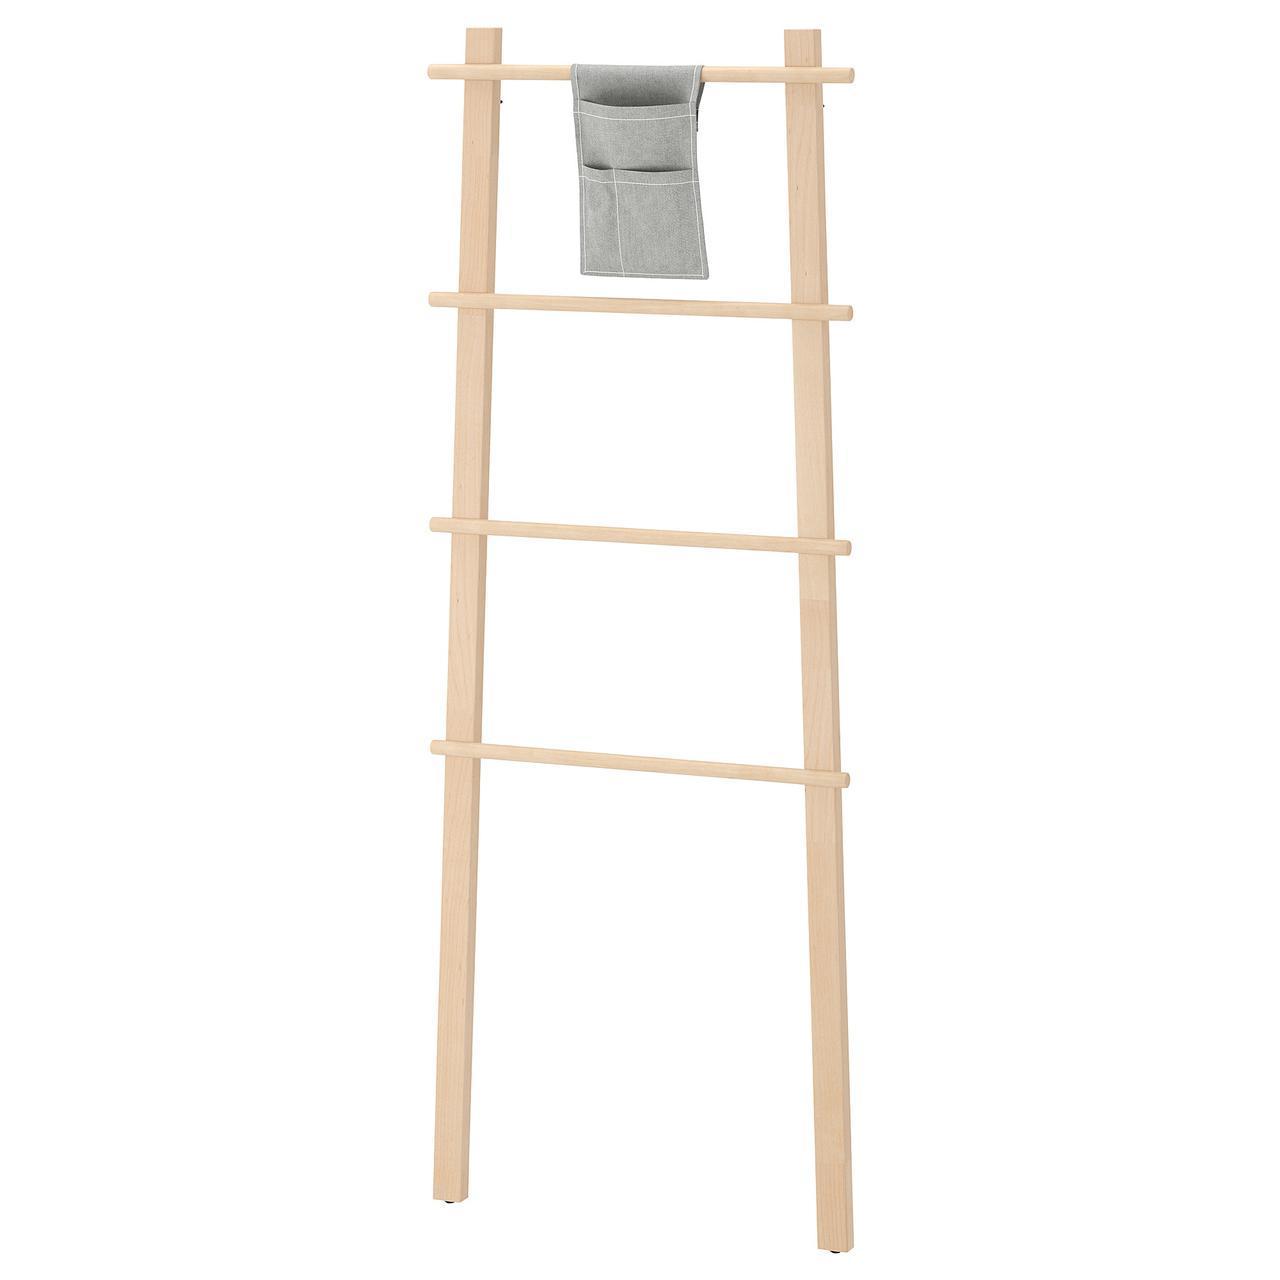 ✅ IKEA VILTO (003.444.51) Подставка для полотенец